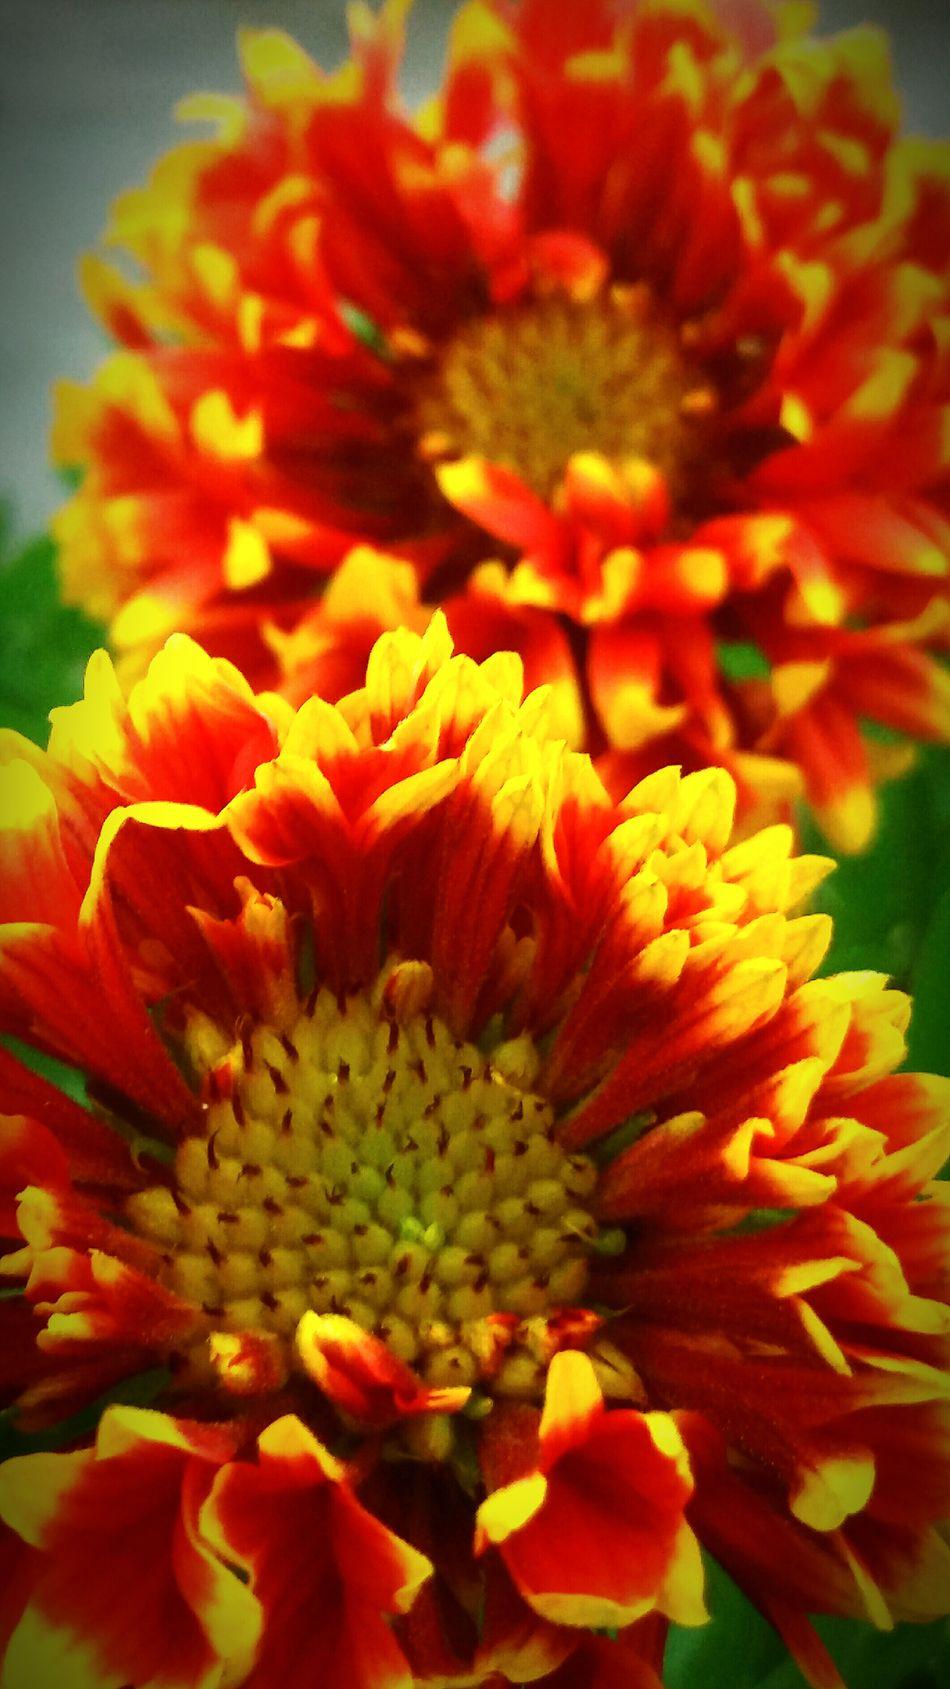 The Fiery Flower... First Eyeem Photo